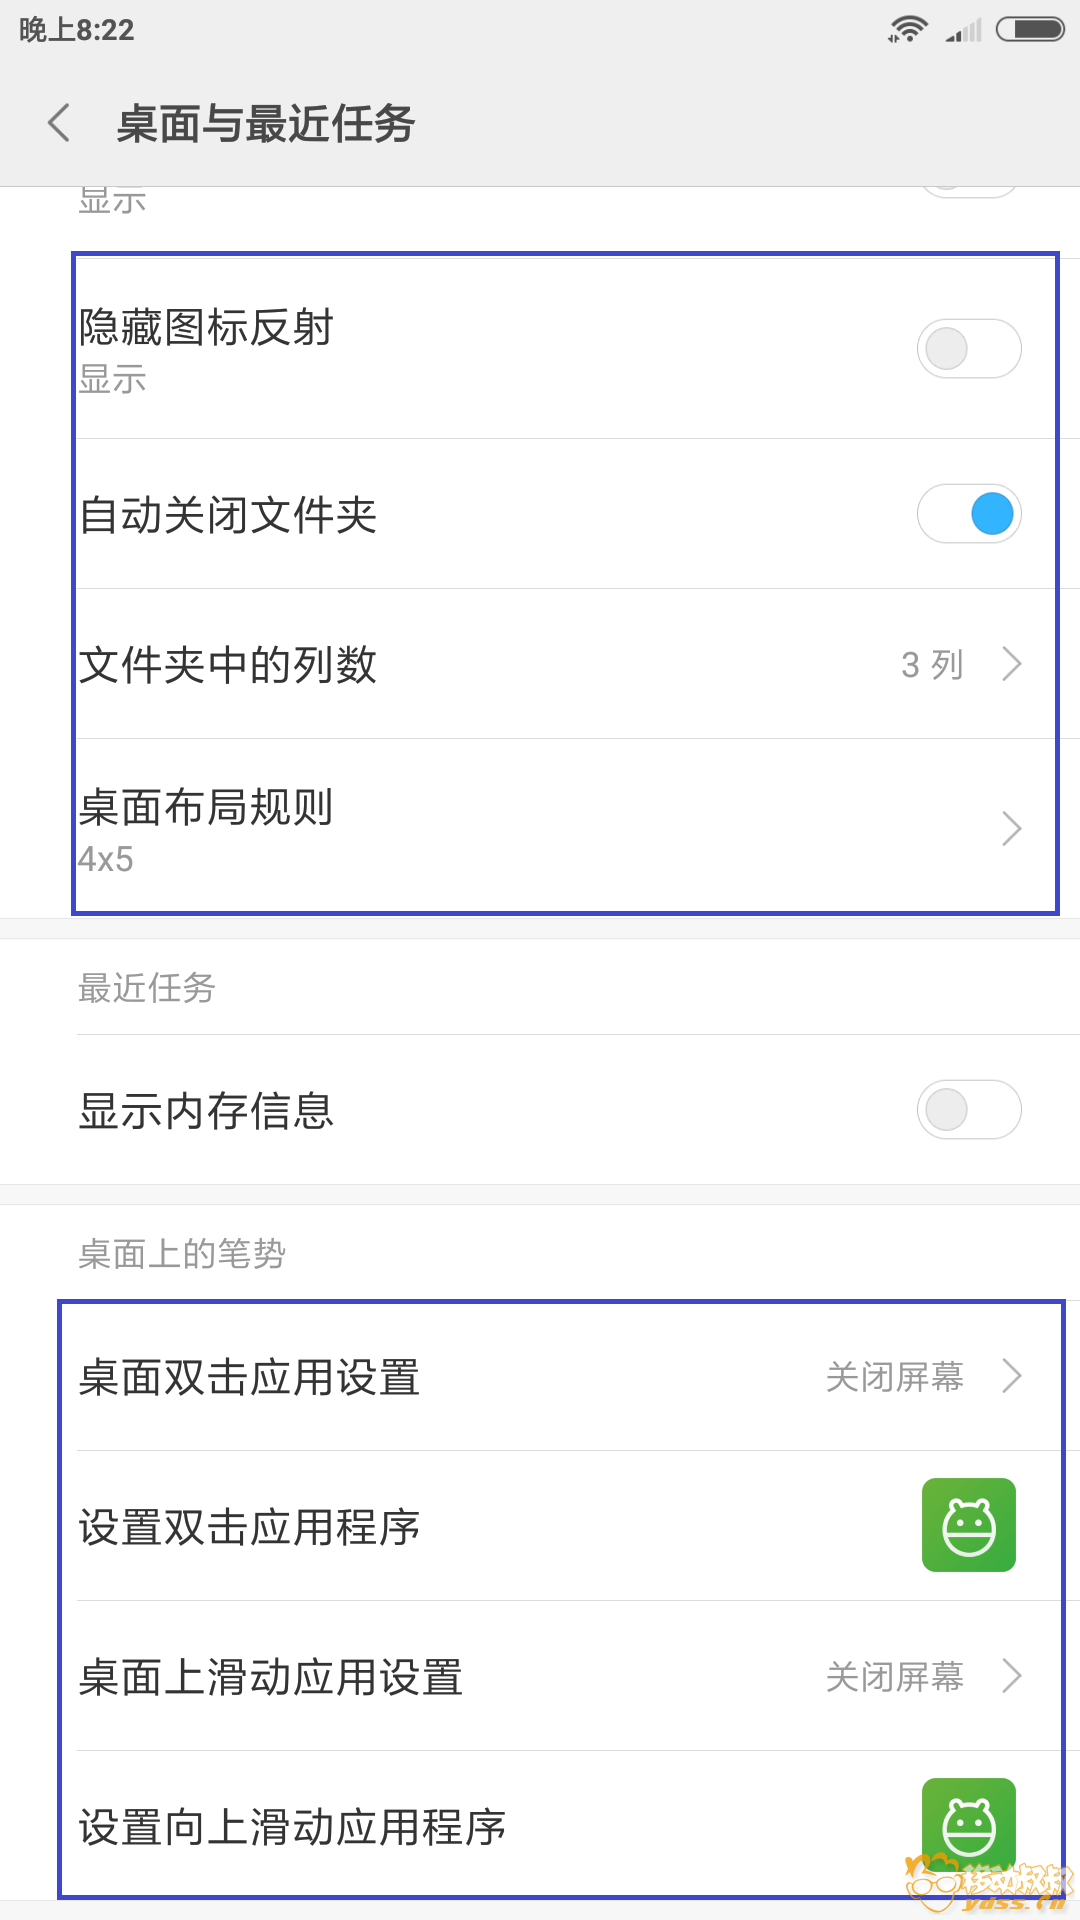 Screenshot_2018-02-28-20-22-32-637_com.android.settings.png